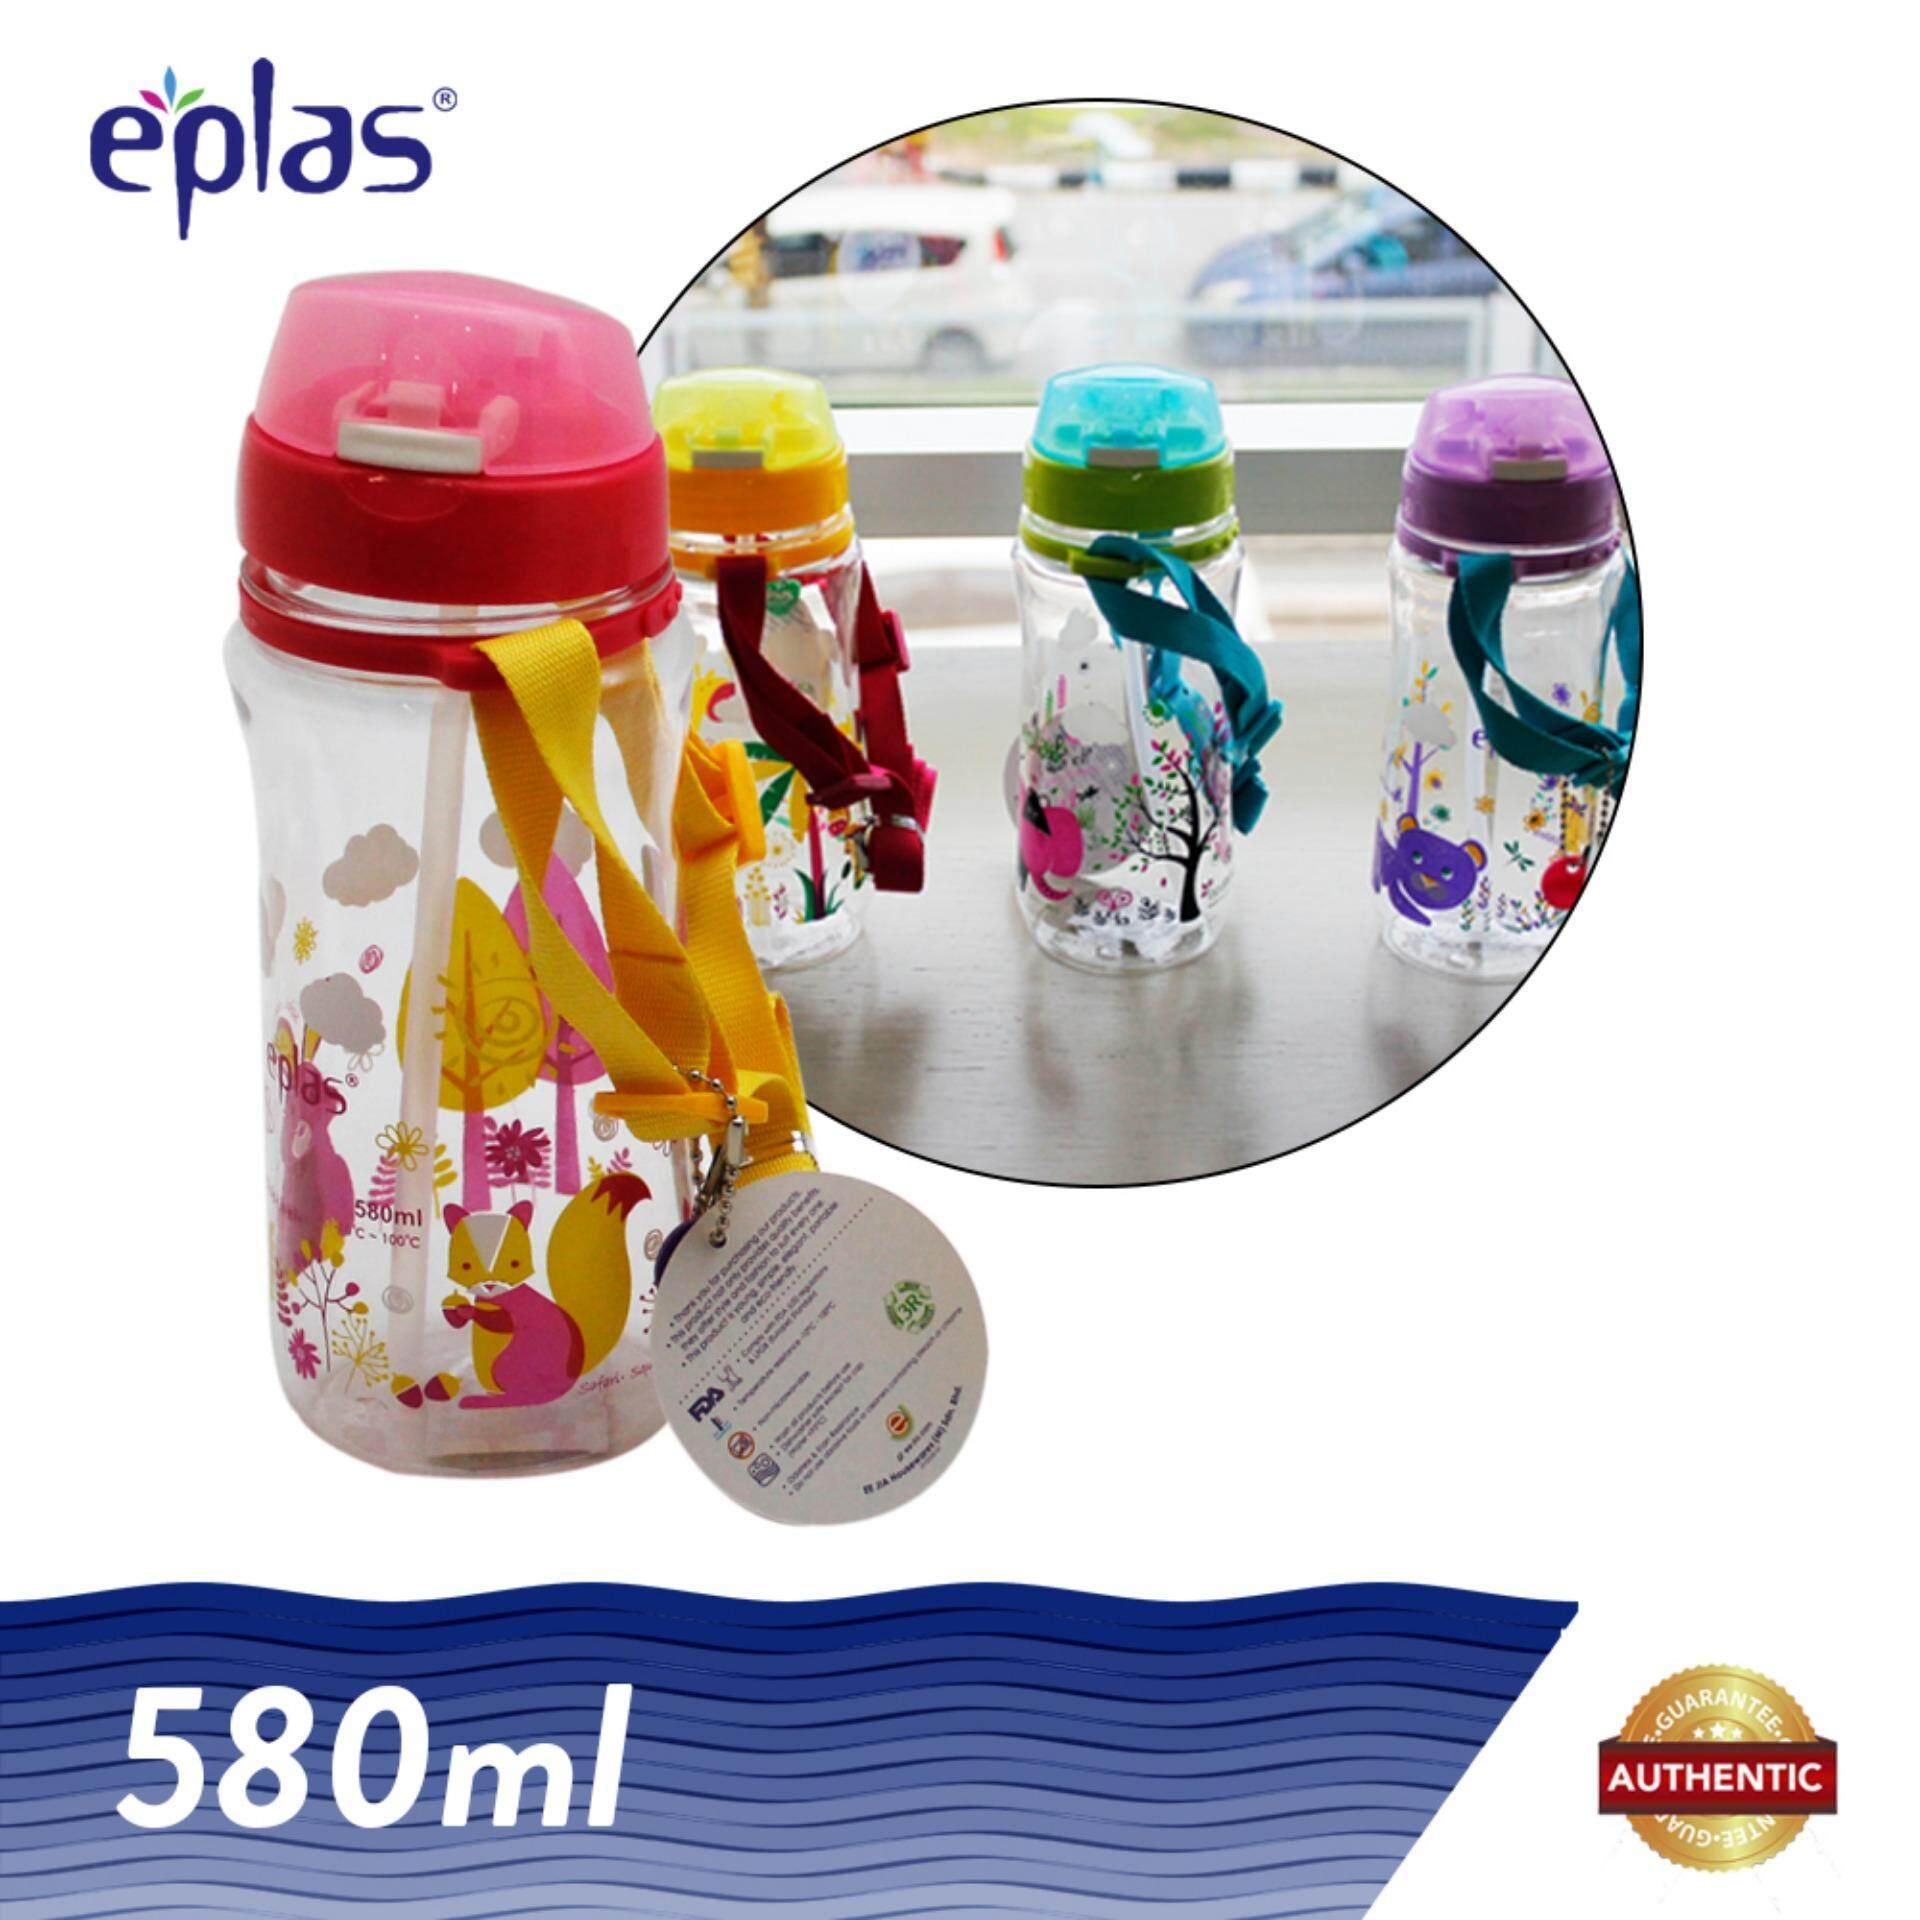 eplas 580ml BPA Free Animal Kingdom Kid's Bottle with Straw & Strap